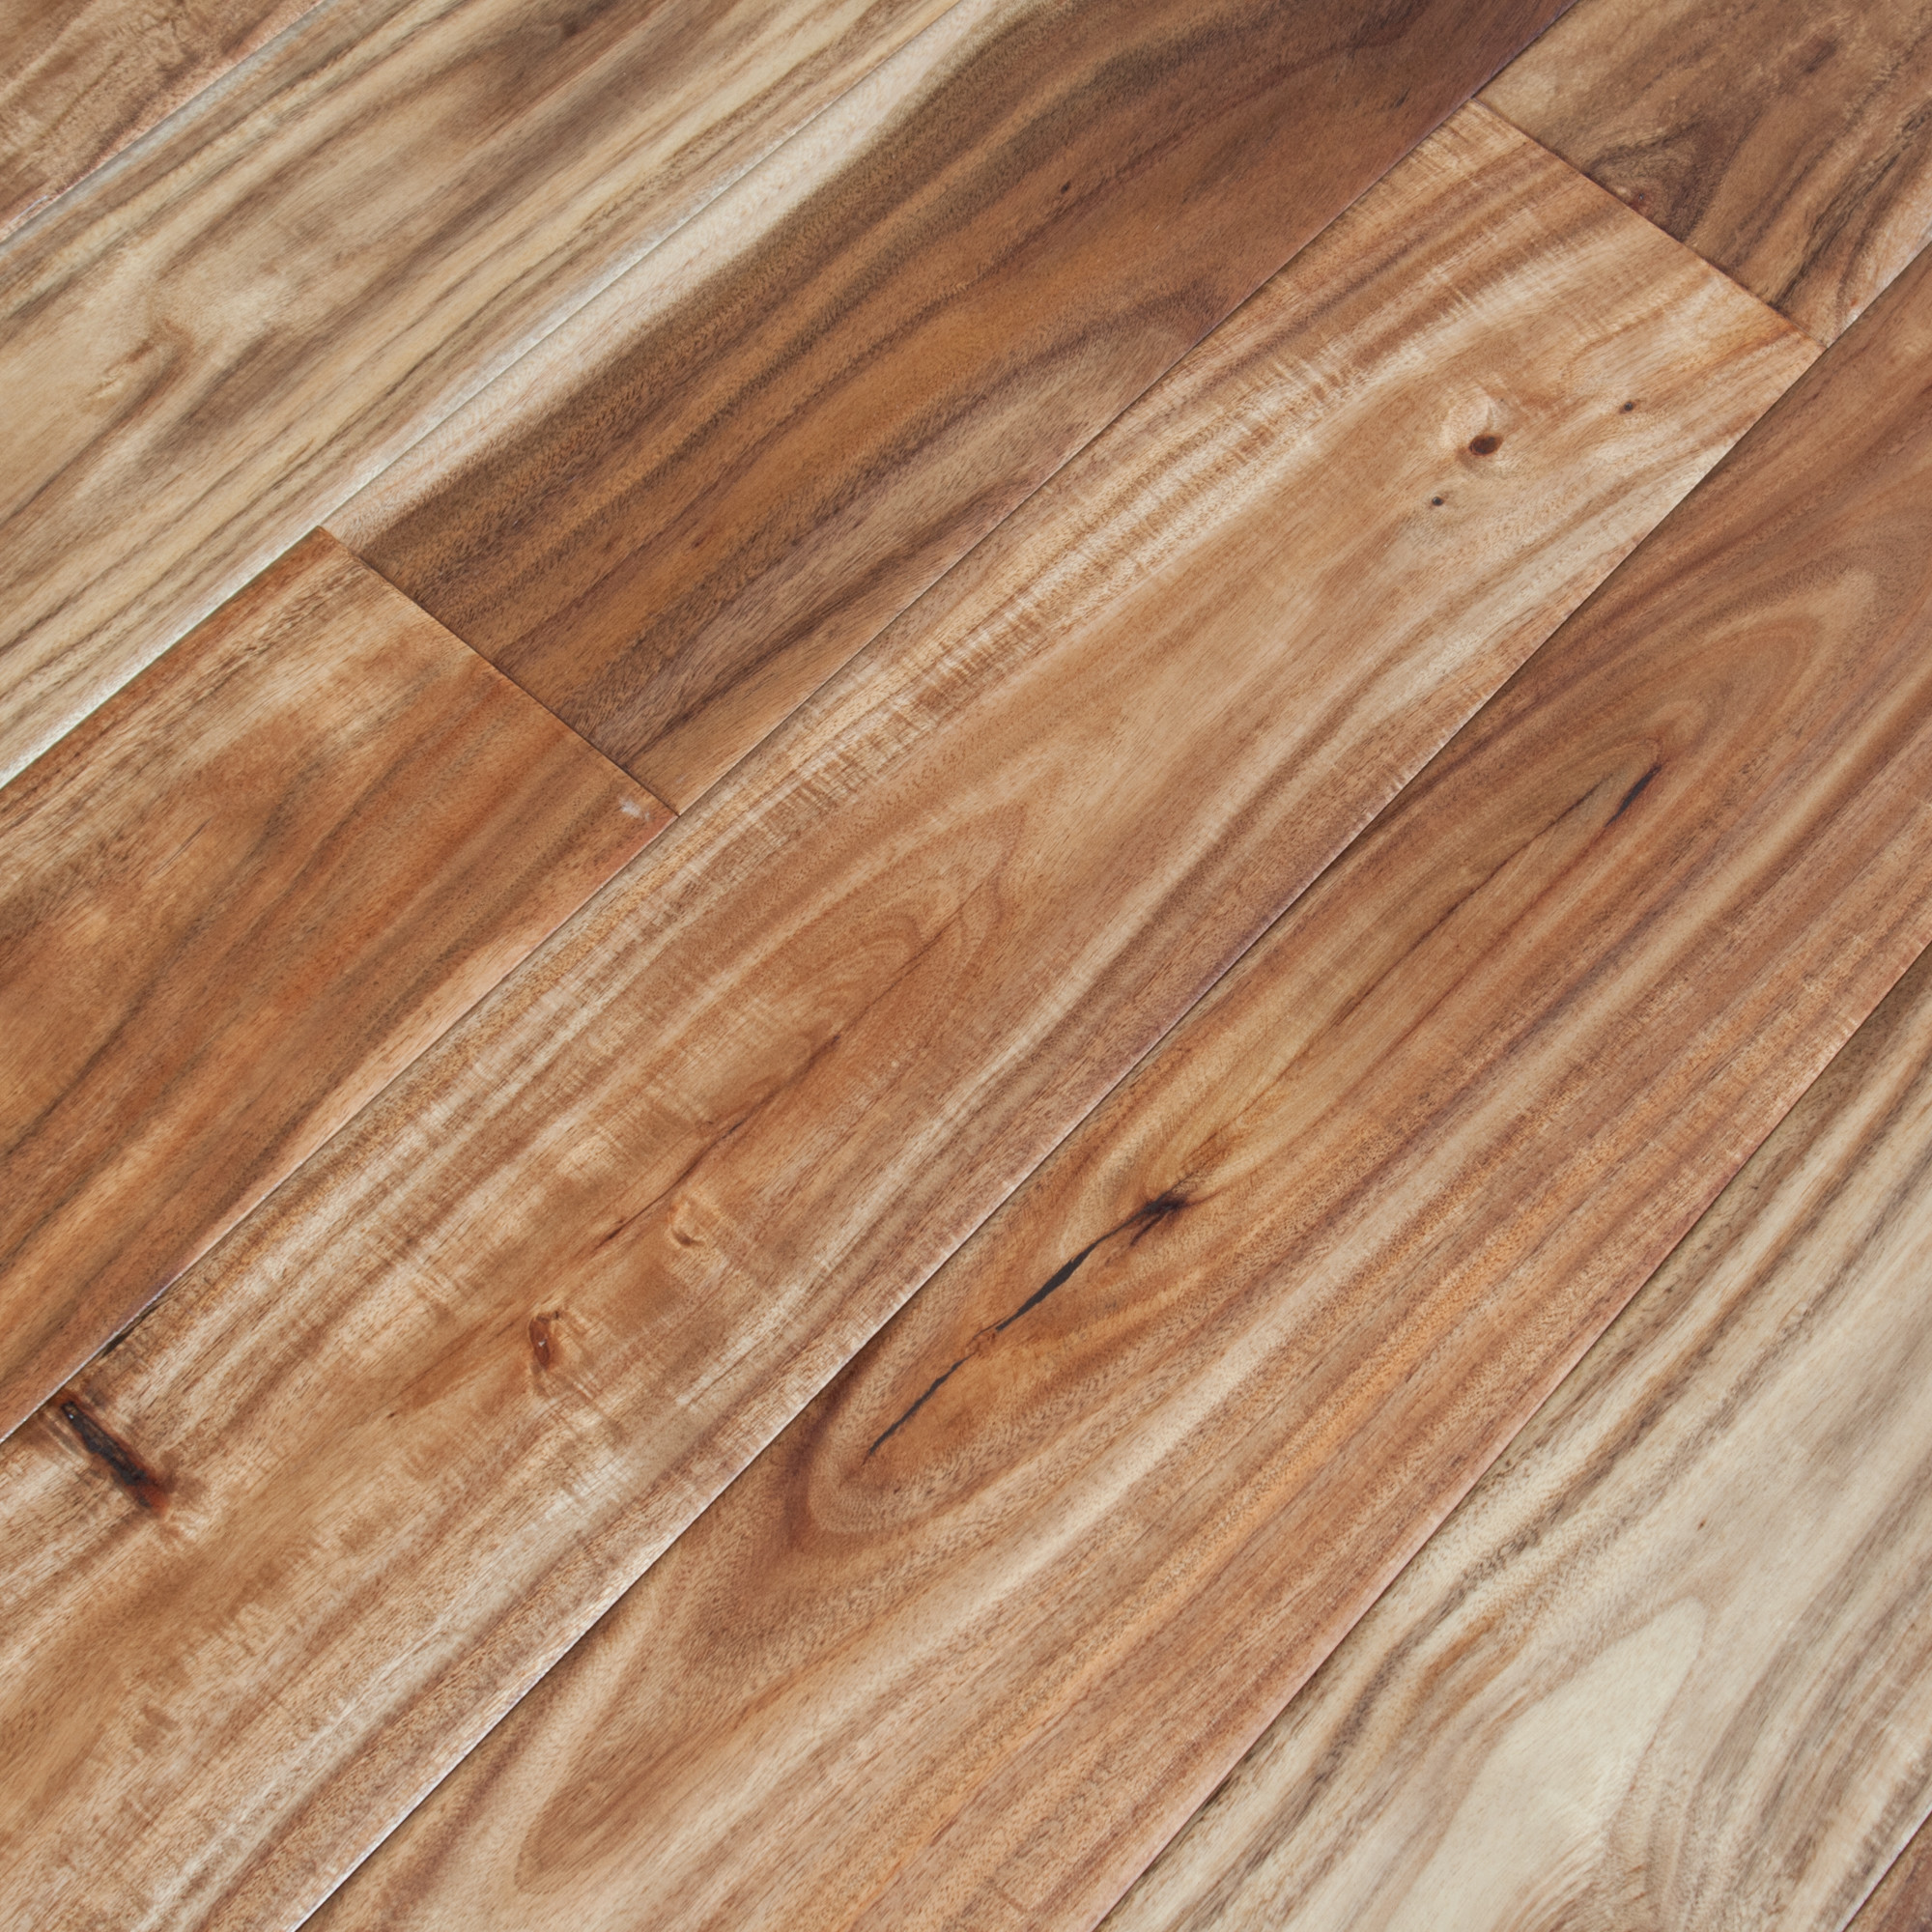 3 4 maple hardwood flooring of 9 mile creek acacia hand scraped acacia confusa wood floors inside acacia handscraped natural hardwood flooring